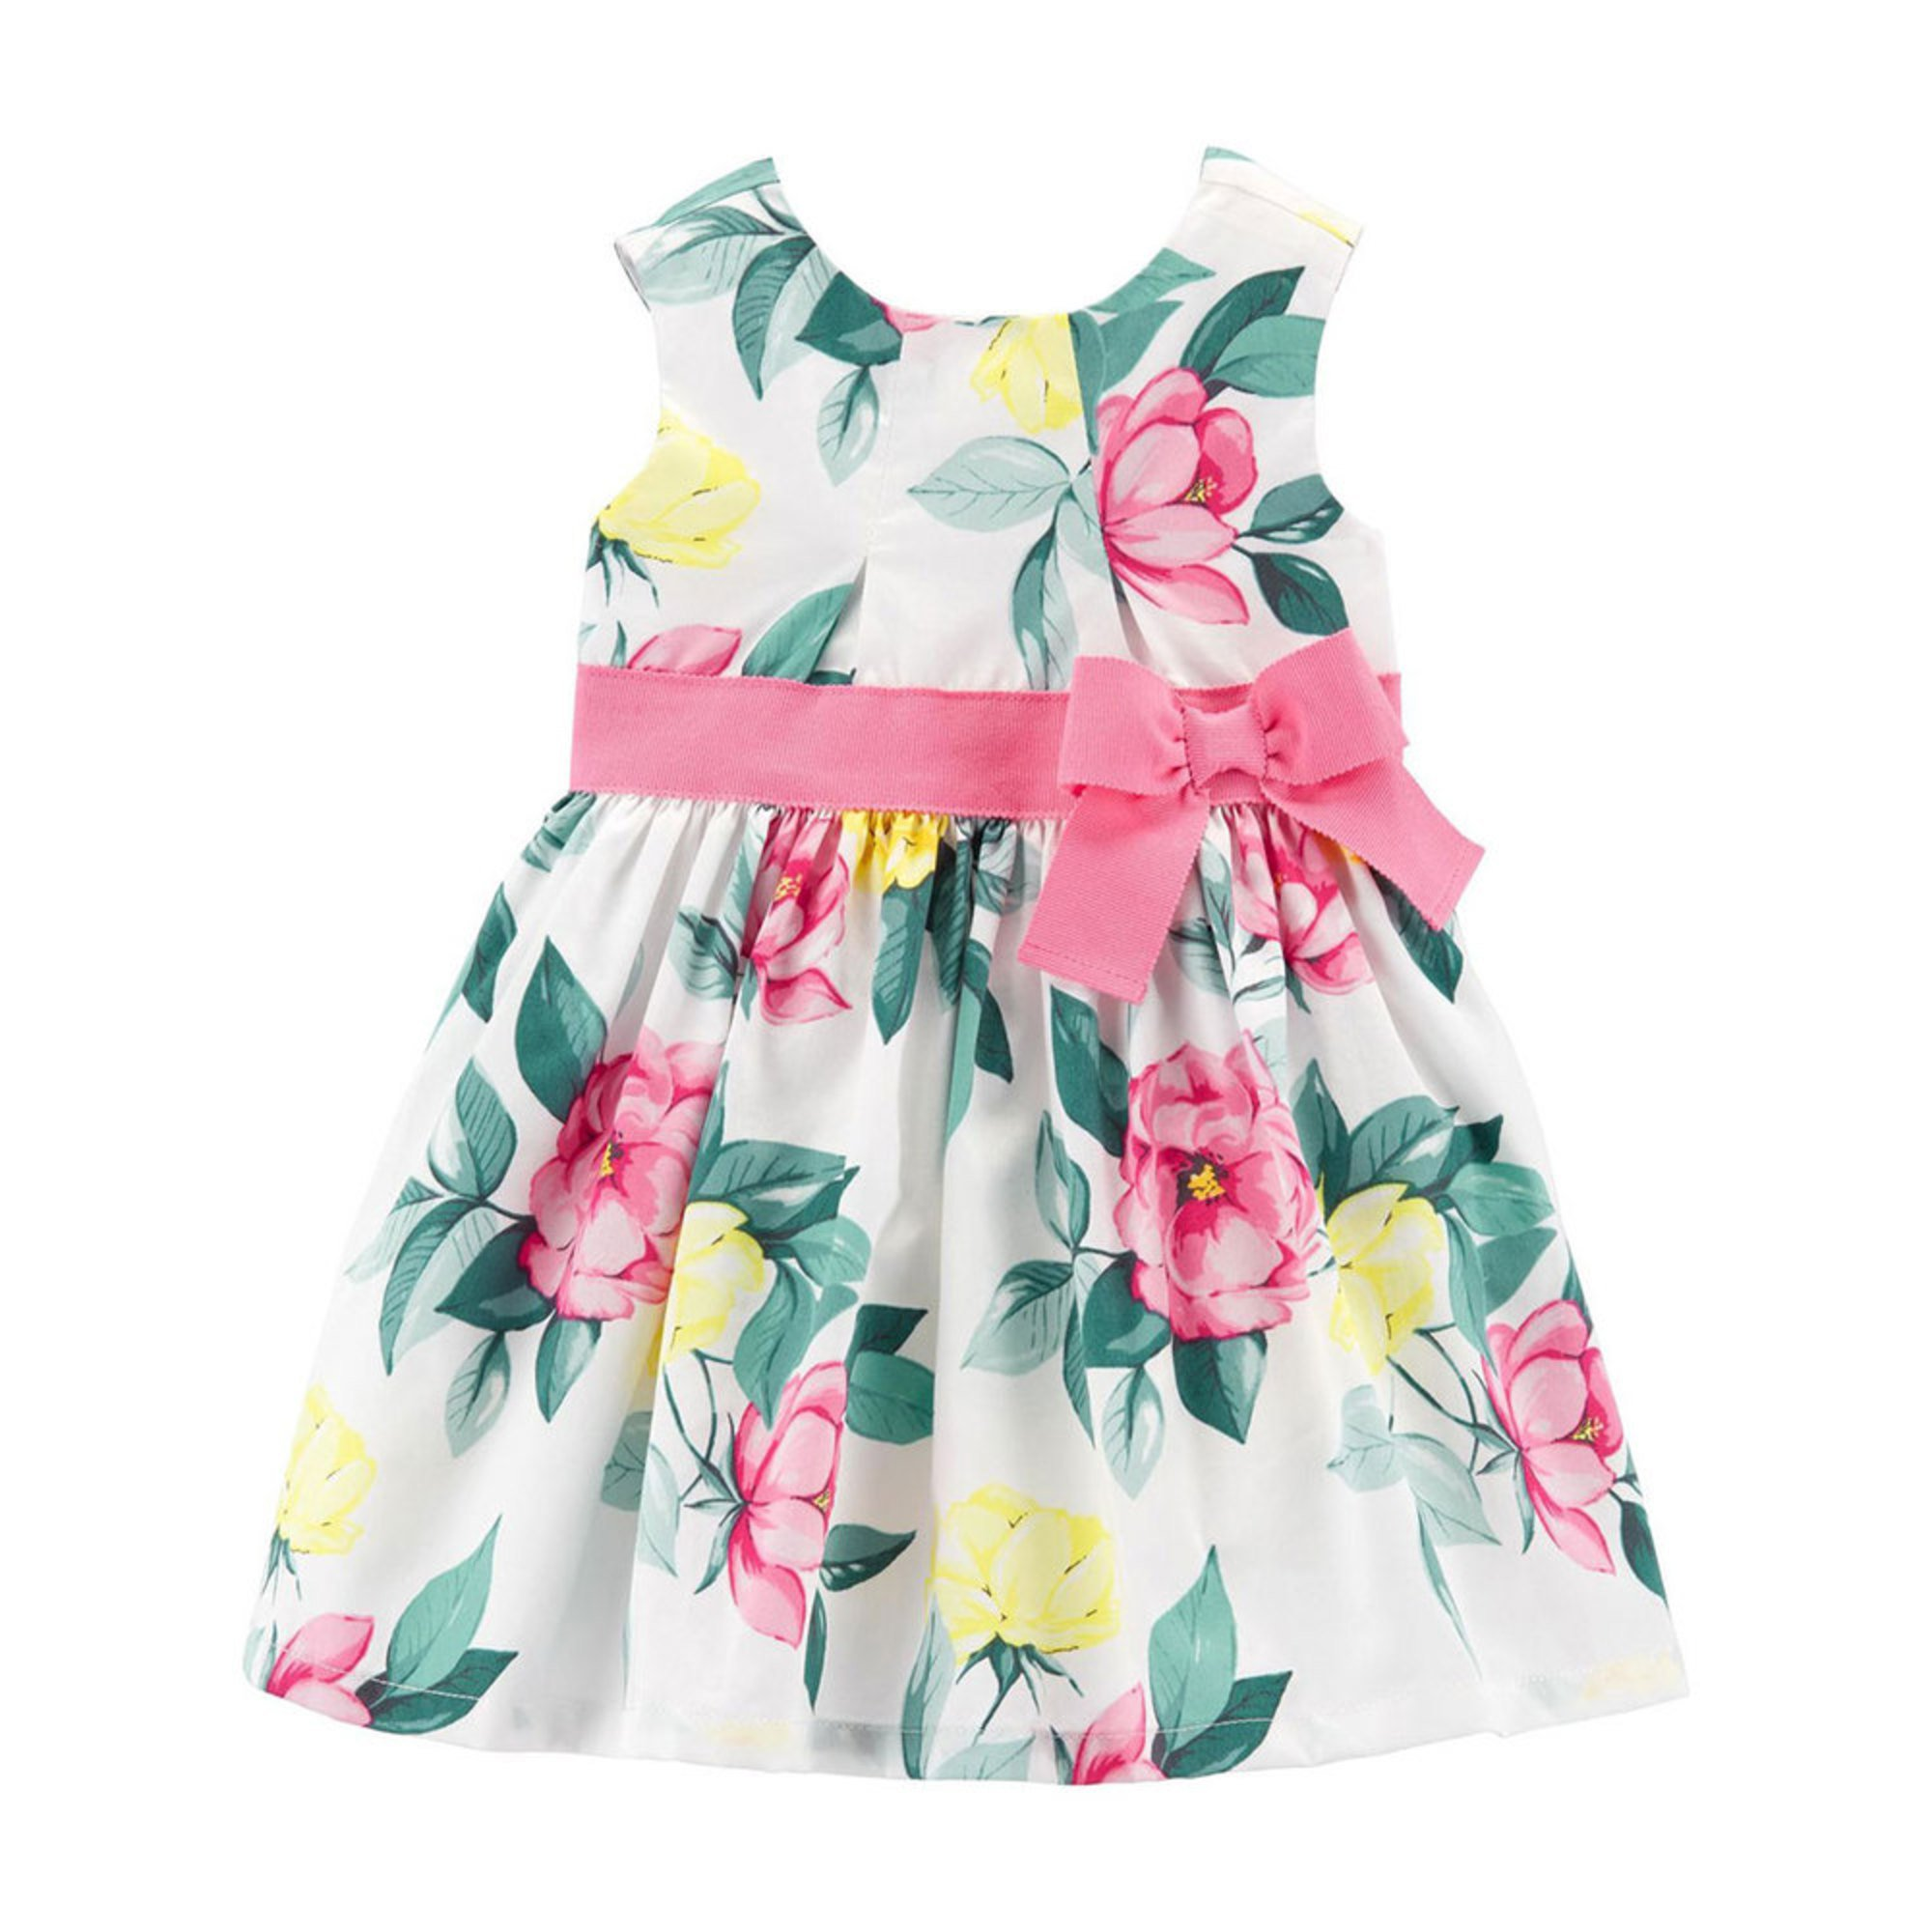 453add942ddd0 Carter's Baby Girls' Floral Dress